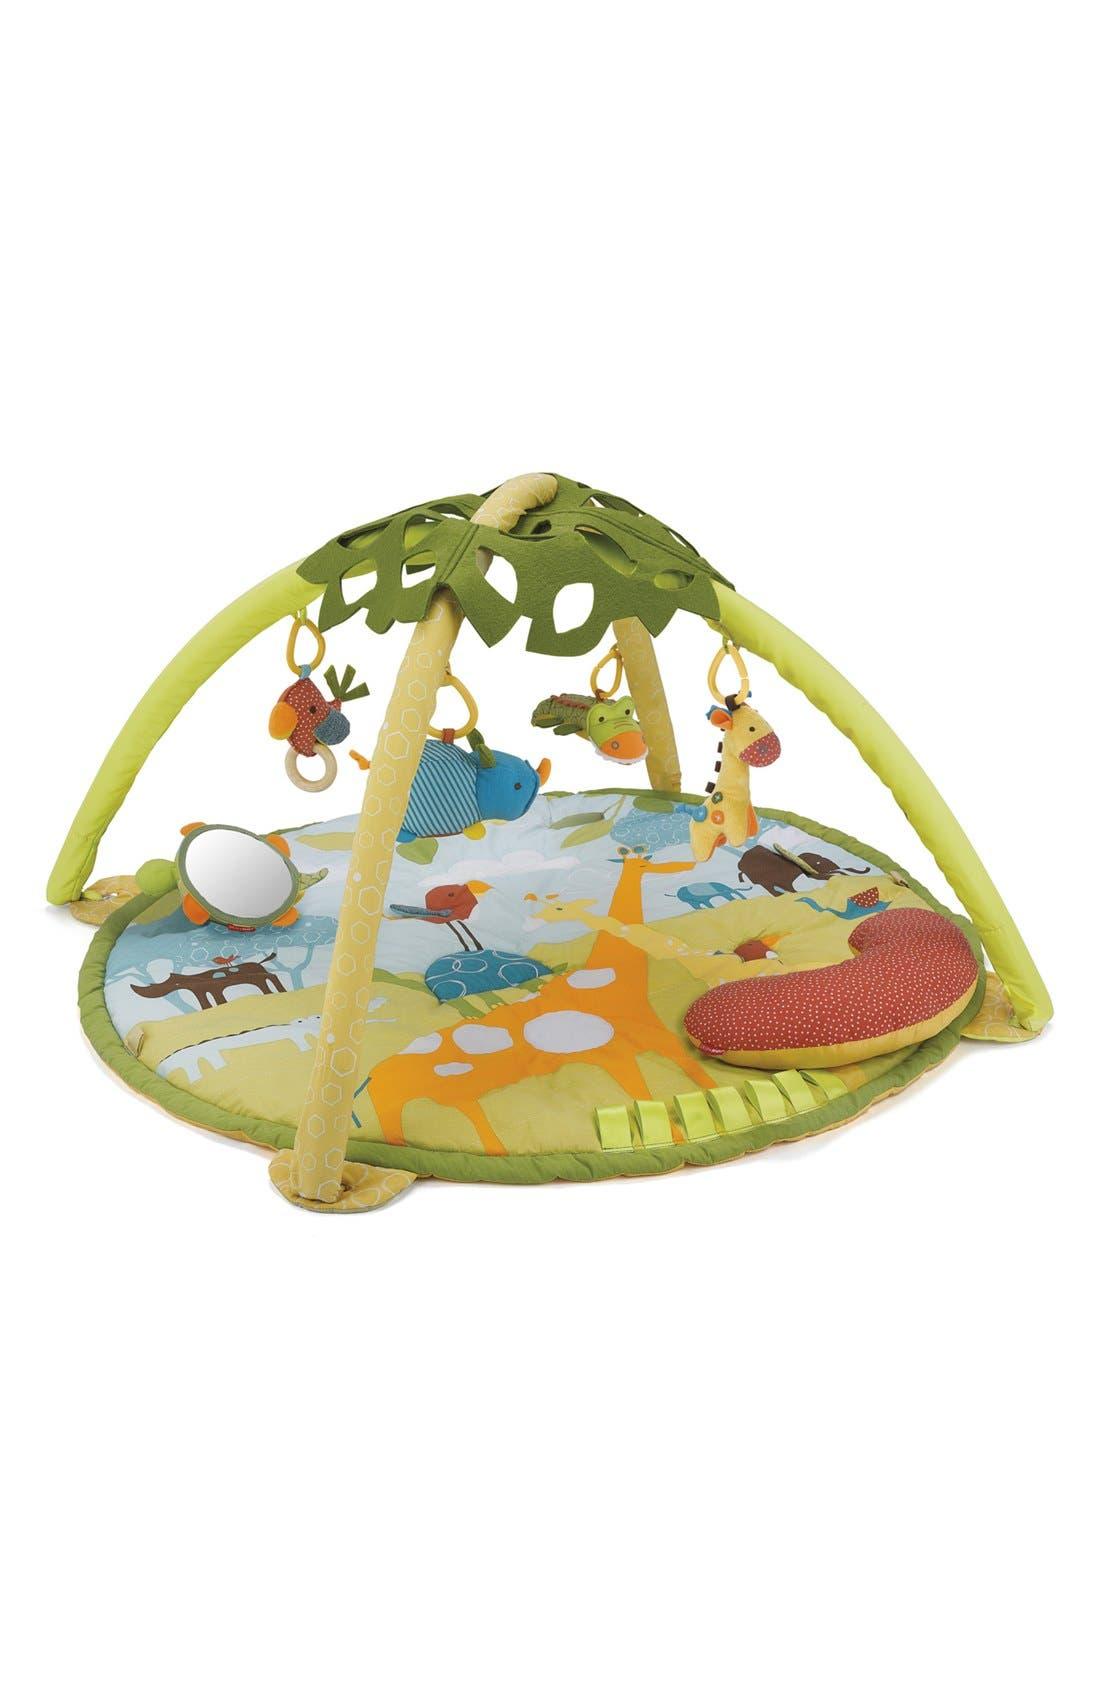 Main Image - Skip Hop 'Giraffe Safari' Activity Gym (Baby)